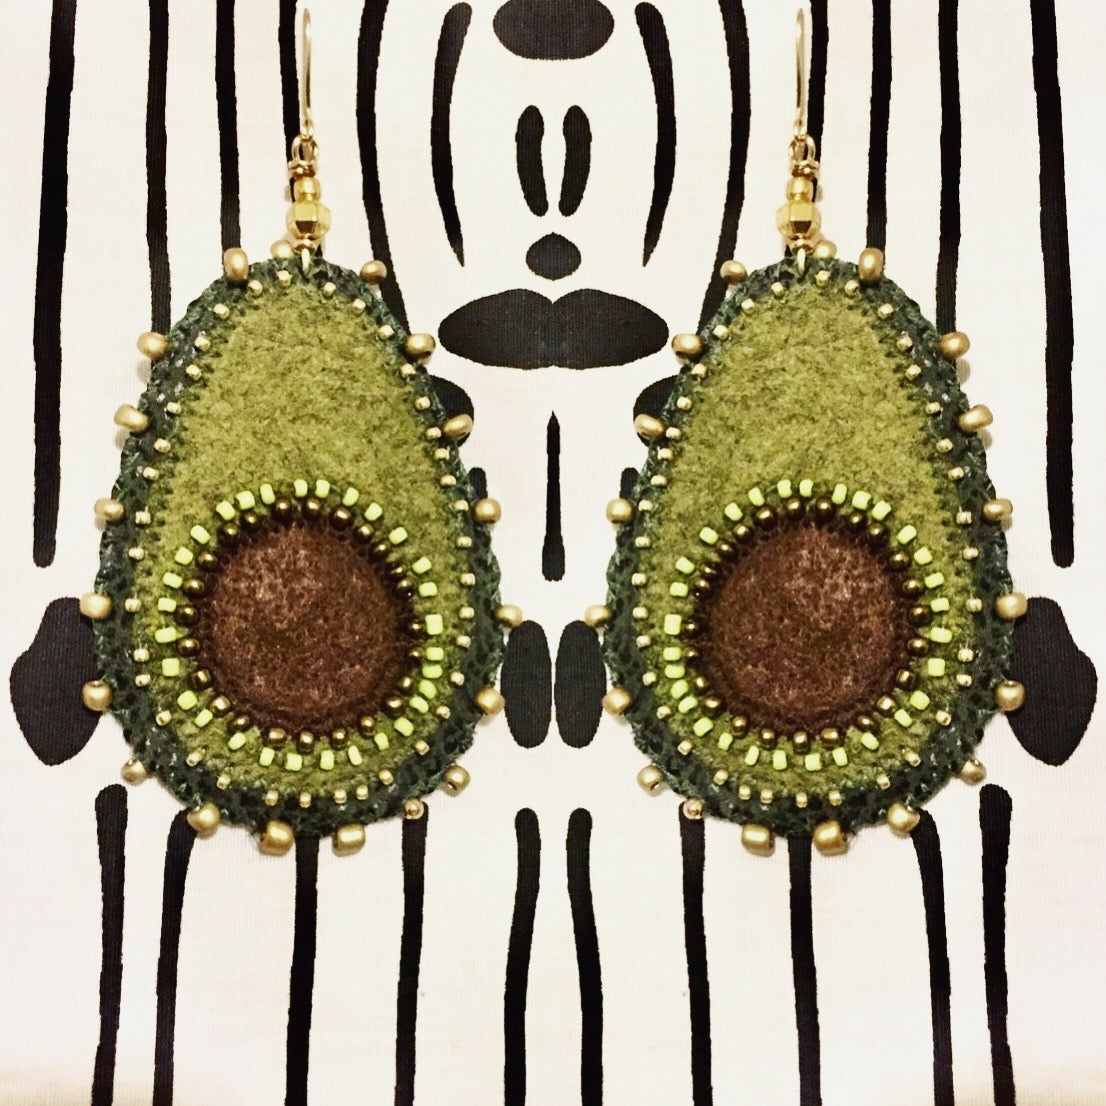 Image of Avocado Goals handmade Earrings -Worn by Tabitha Brown!